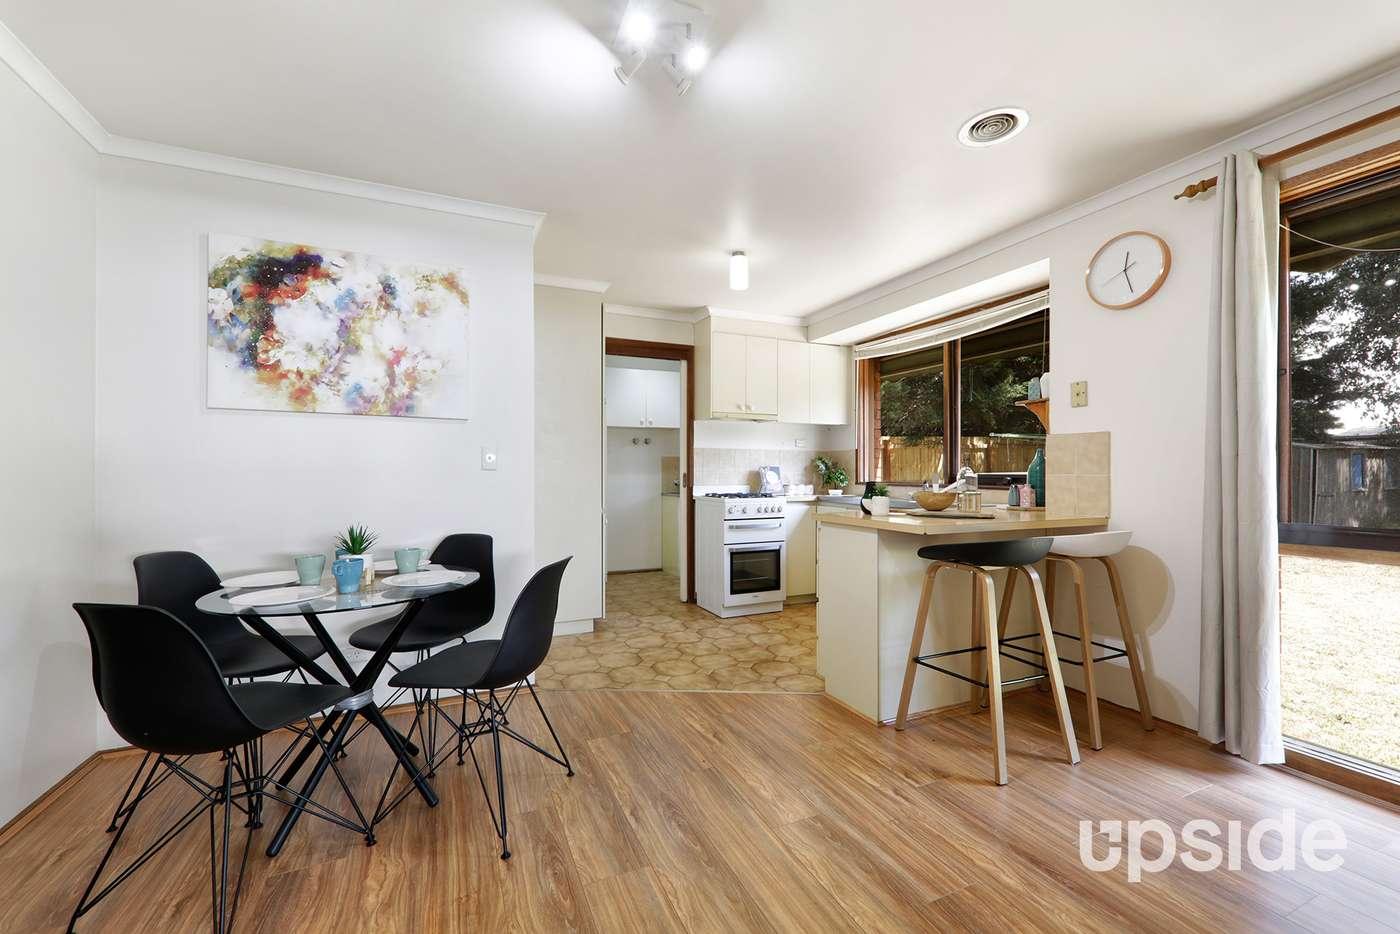 Sixth view of Homely house listing, 15 Mountain Heath Walk, Croydon South VIC 3136